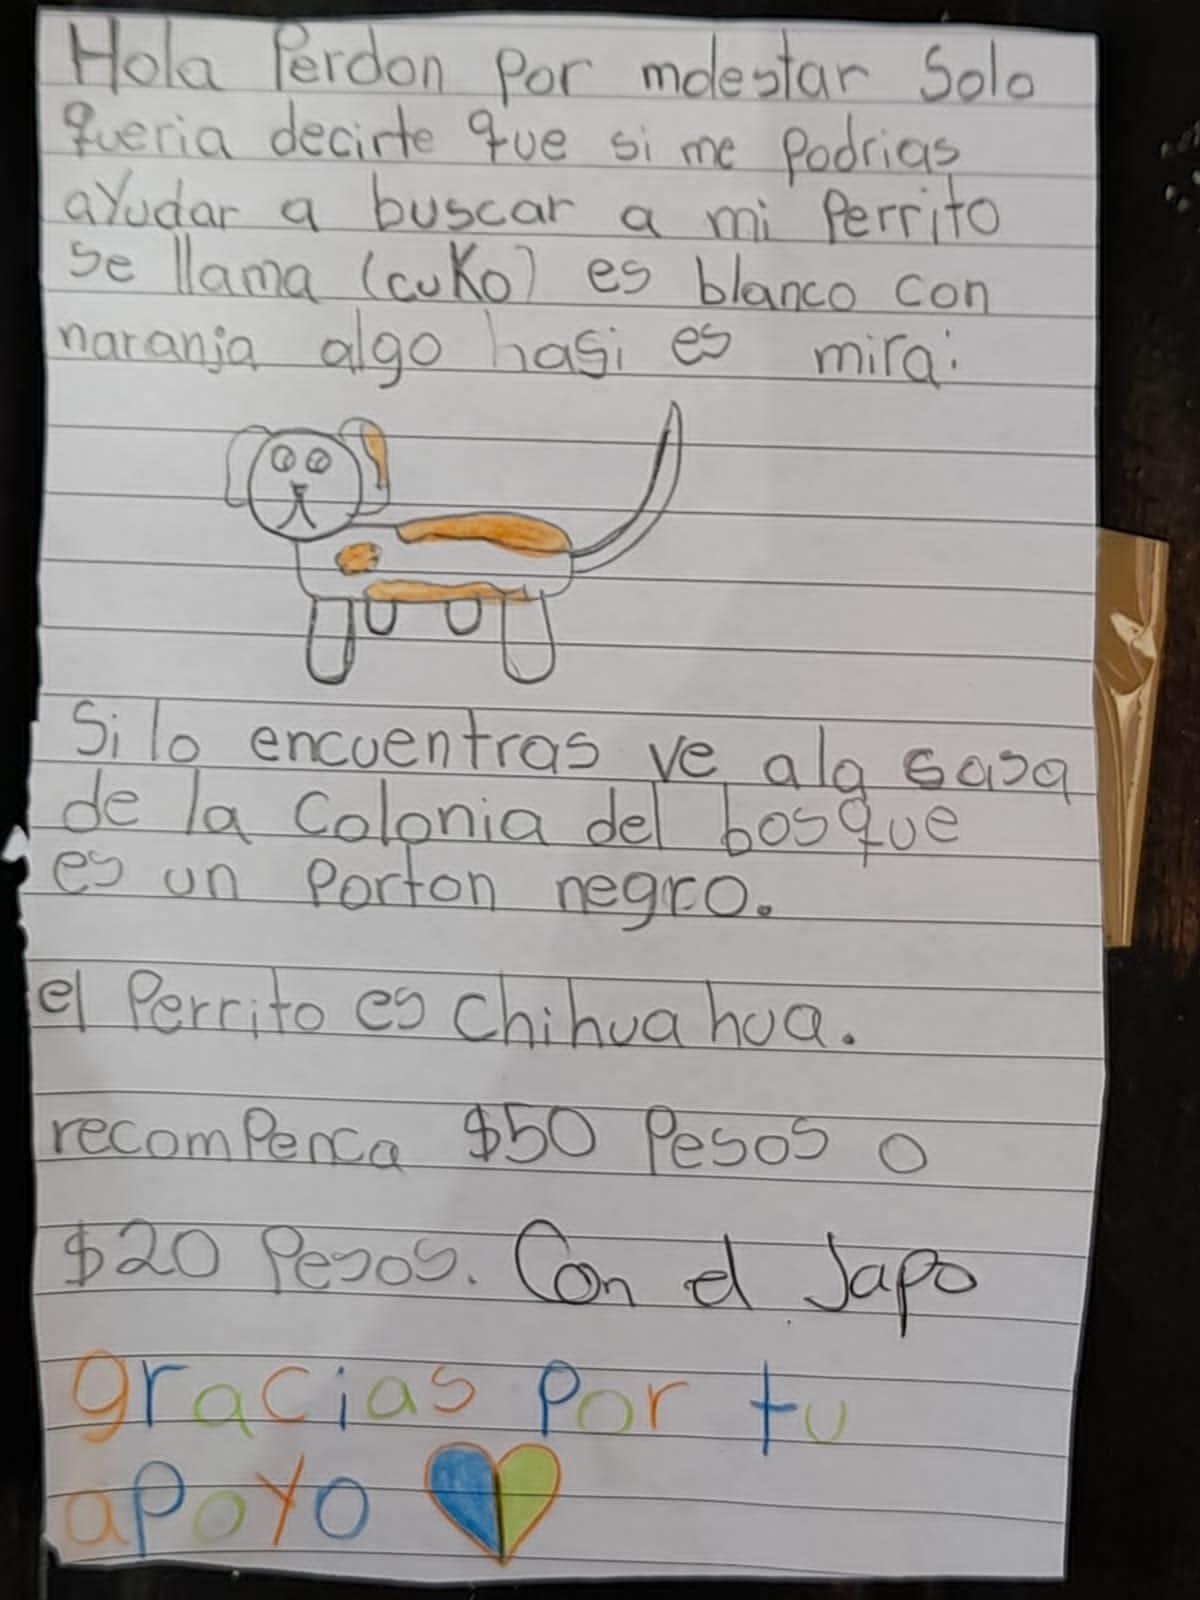 Carta niña buscando perro; Niña que buscaba a su perrito con un dibujo hecho a mano logra encontrarlo